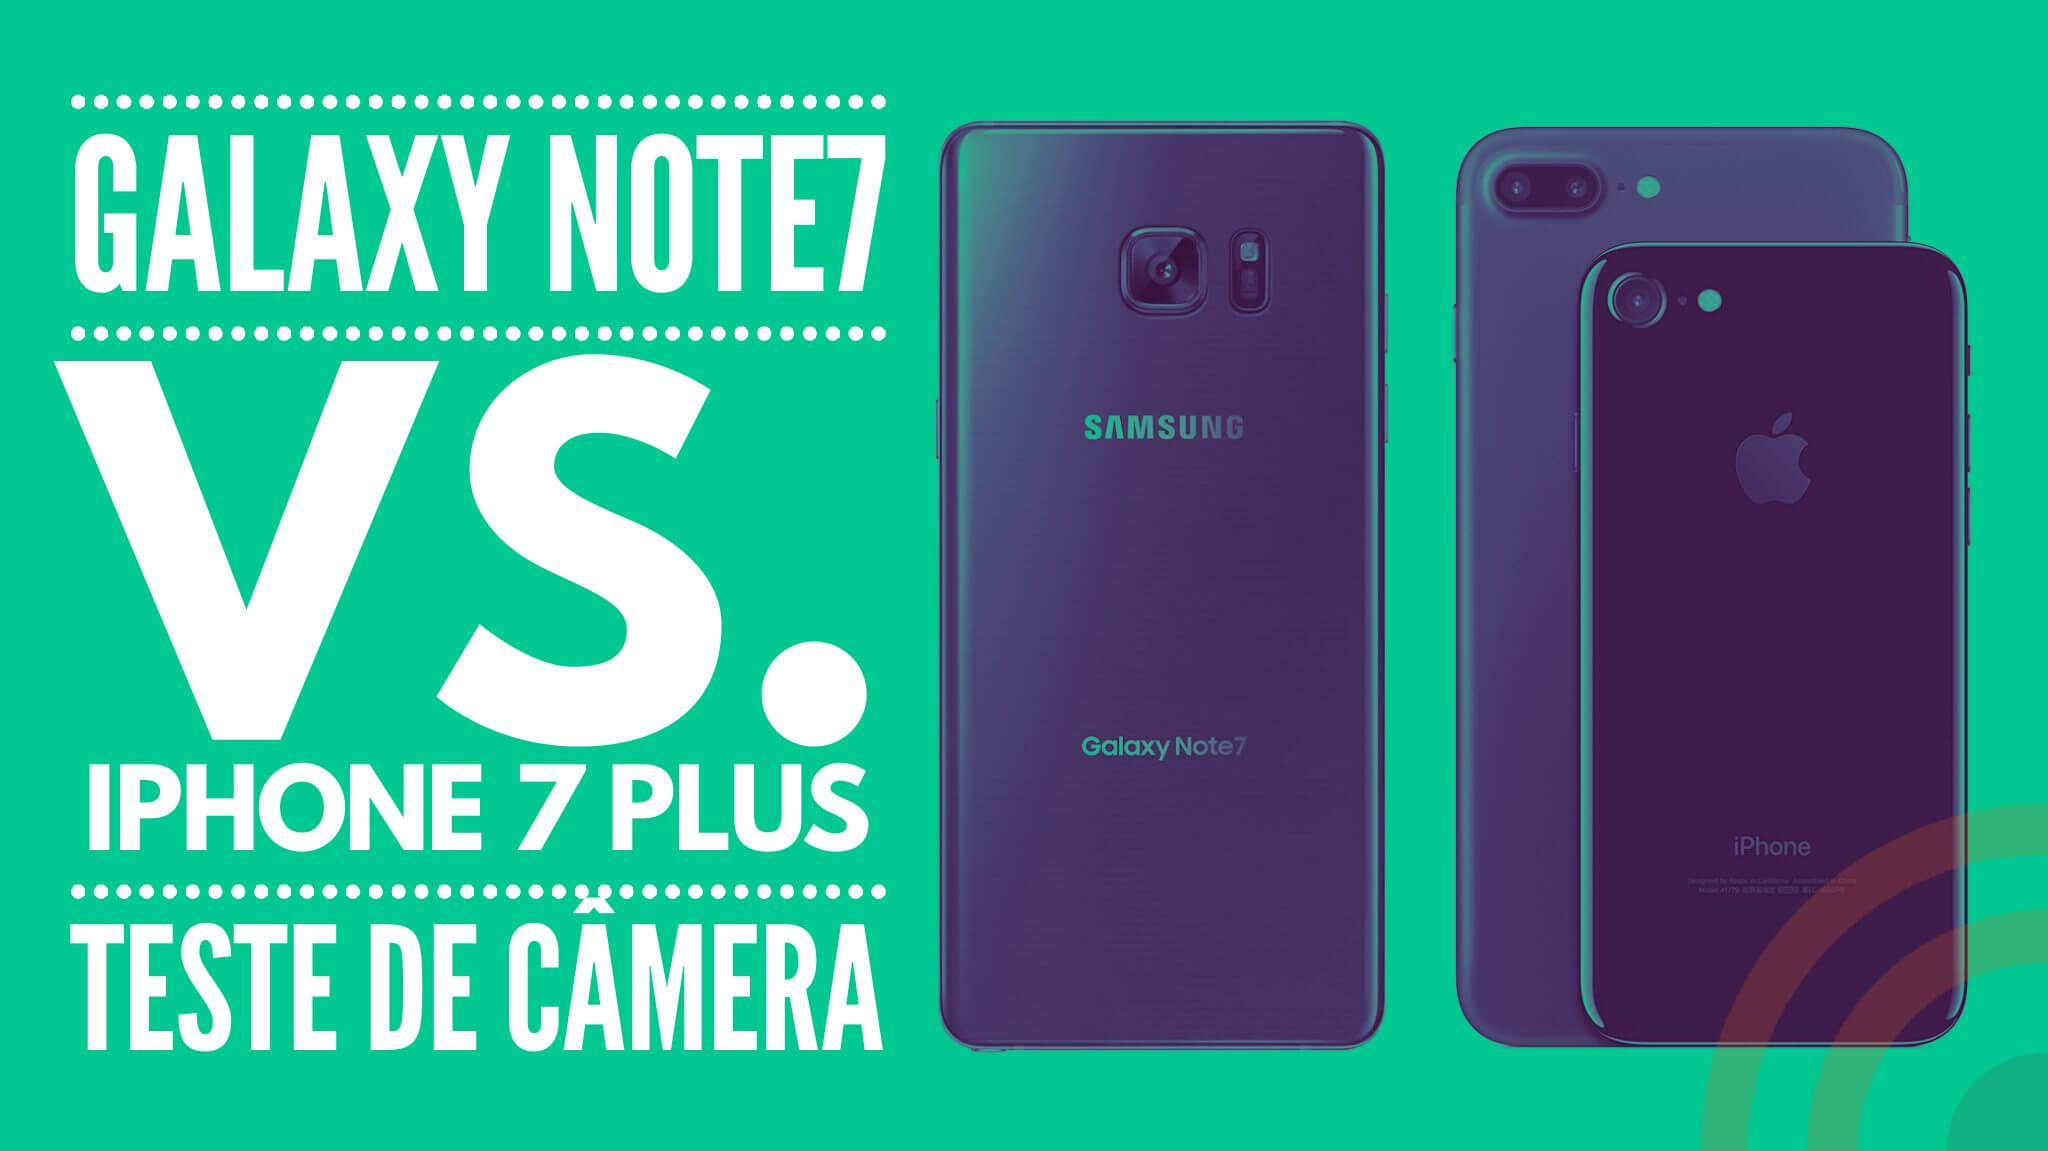 Teste de camera iphone 7 plus galaxy note7